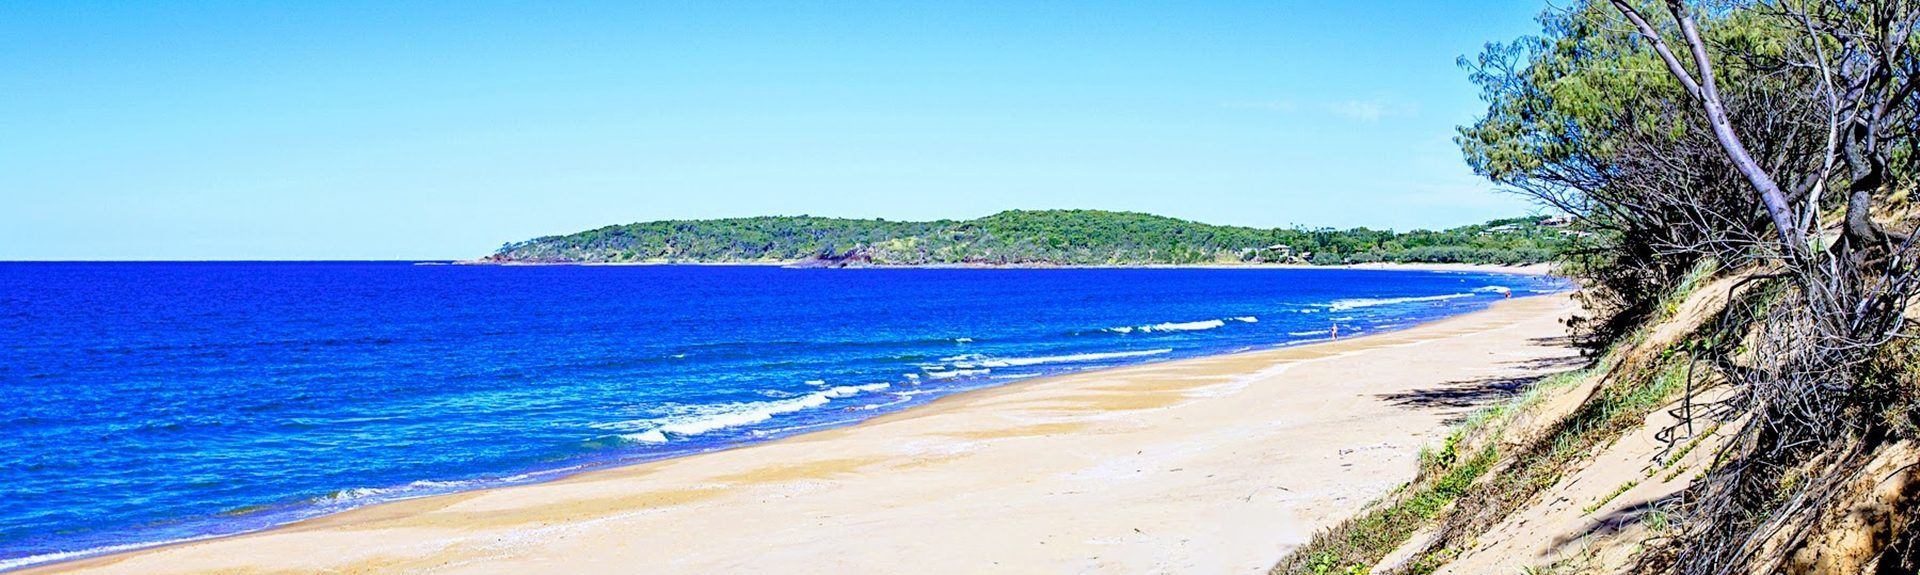 Agnes Water Beach, Agnes Water, Queensland, Australia